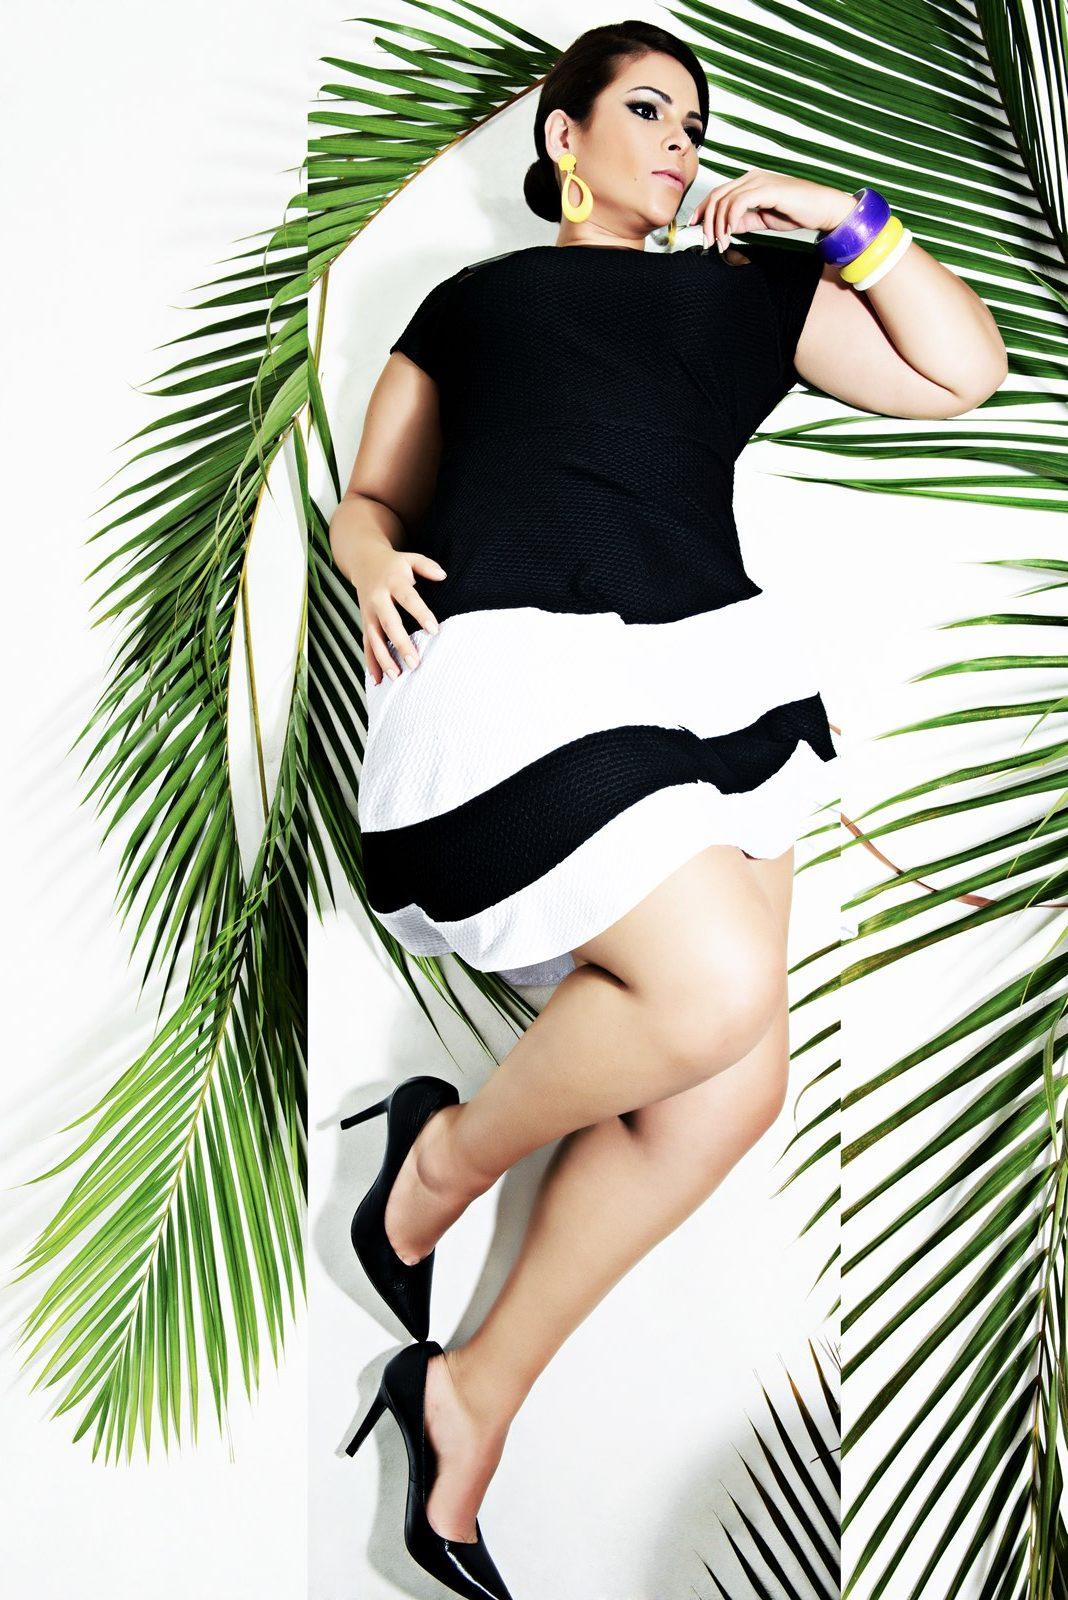 livia-neves-all-curves-magazine-renata-poskus-adriana-libini